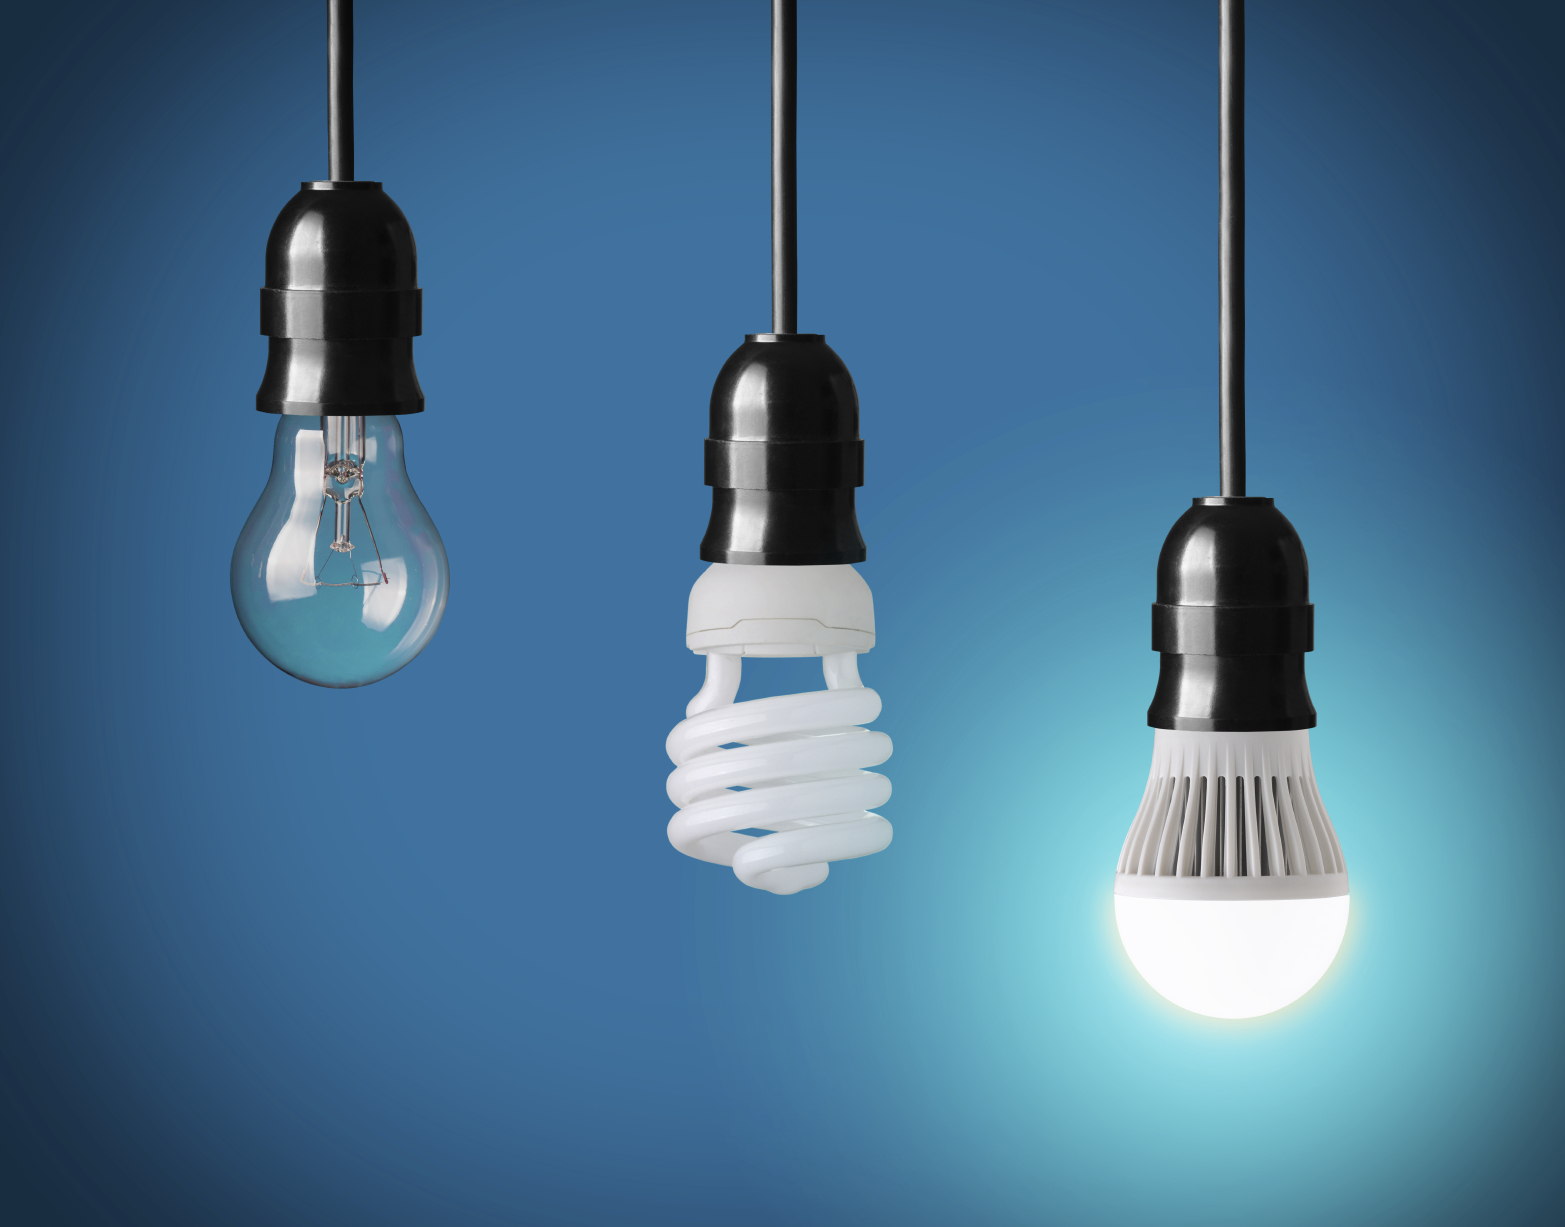 LED light bulb, energy saving